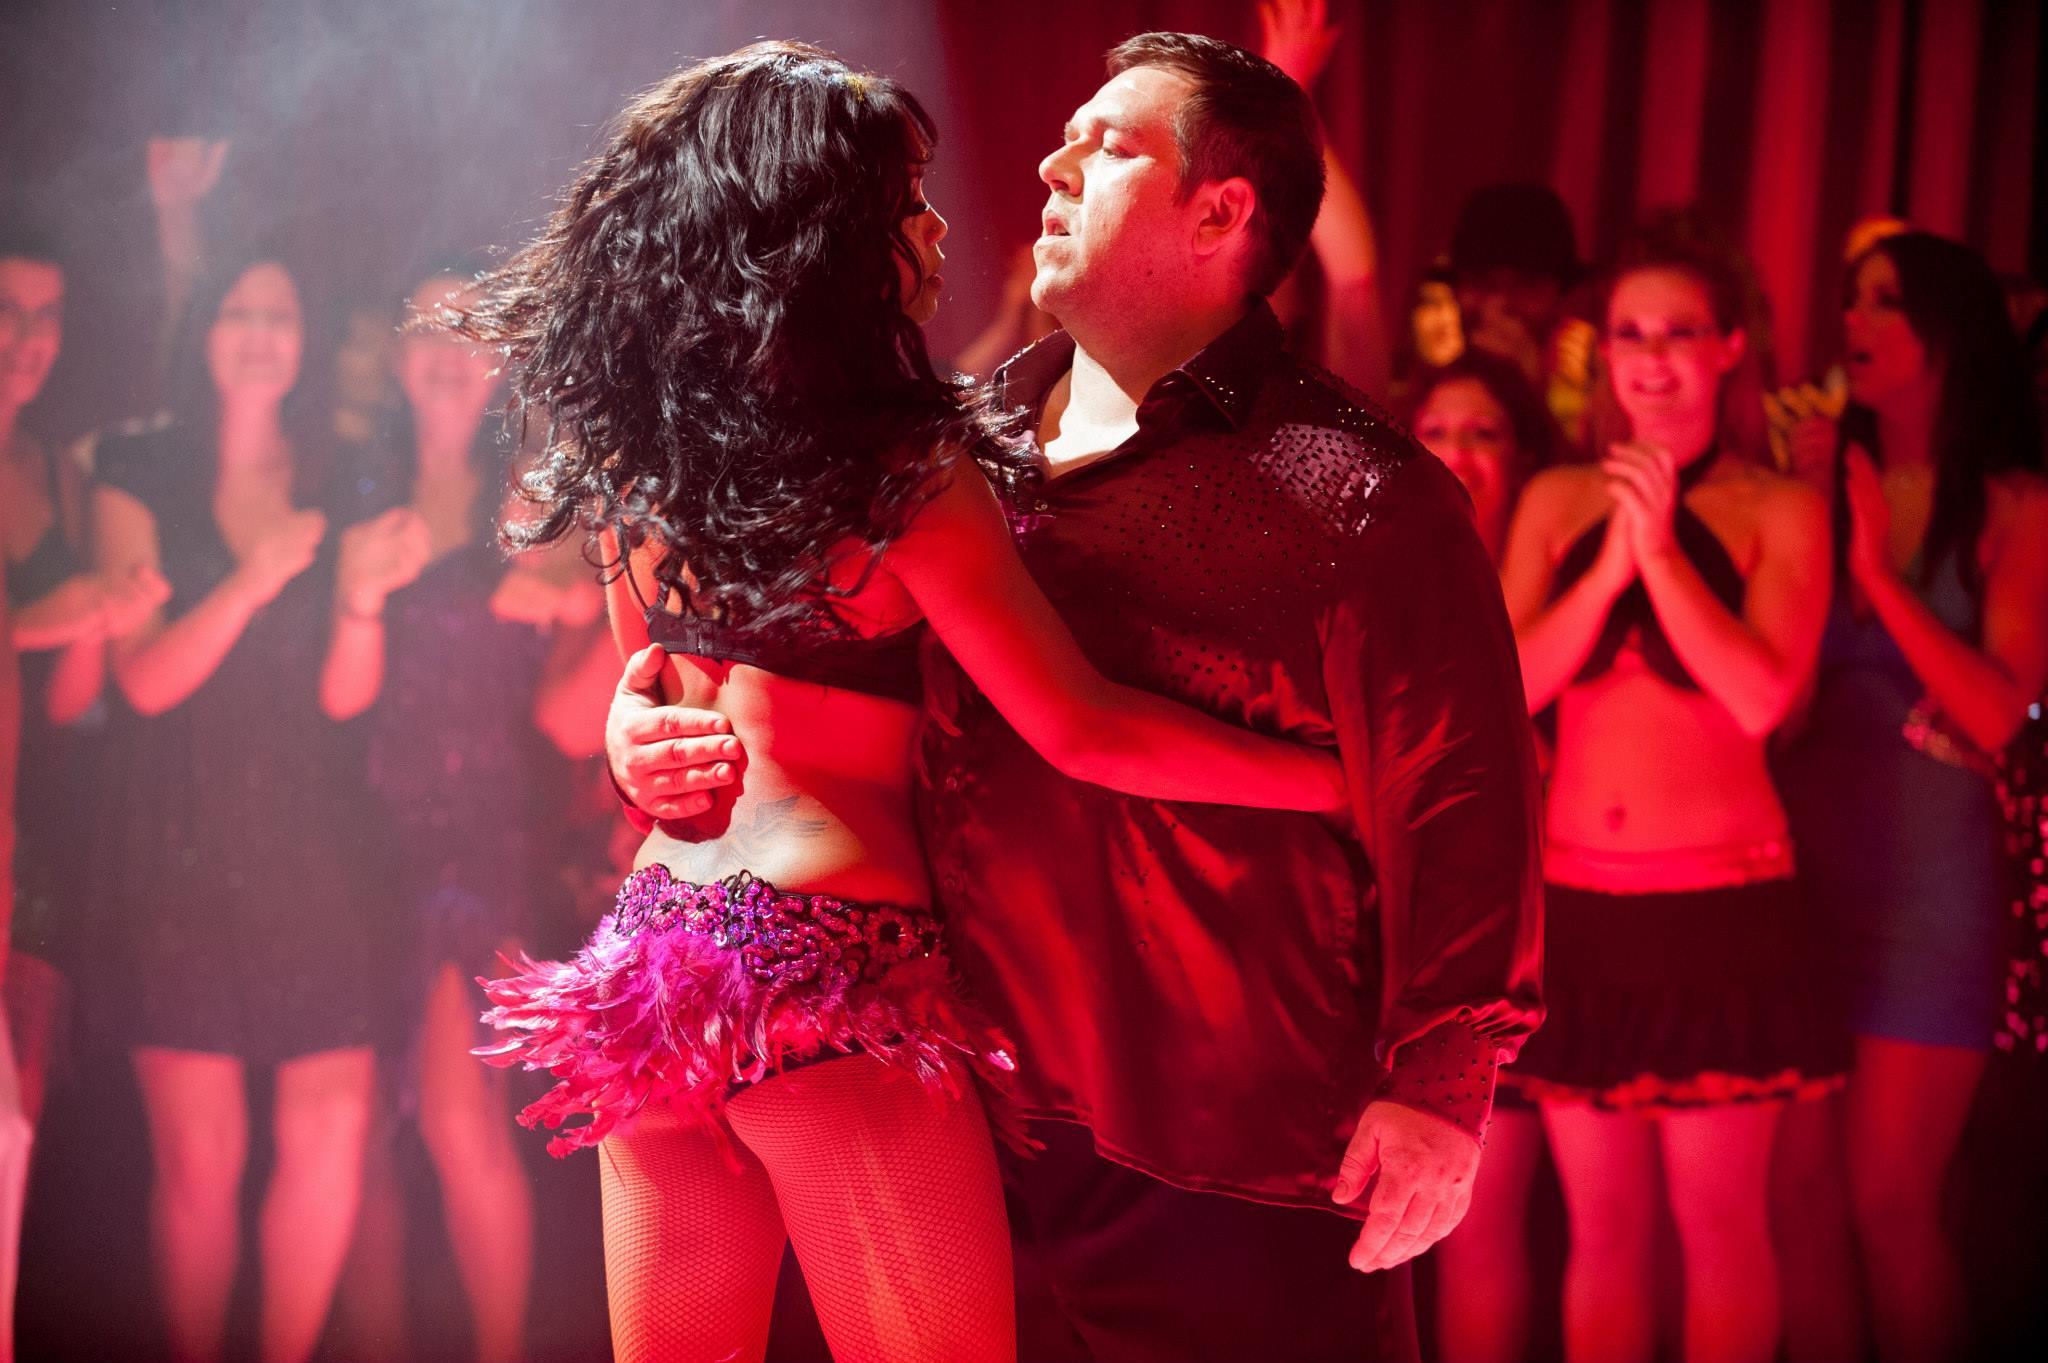 Top 12 Salsa Dancing Movies - Salsa Vida